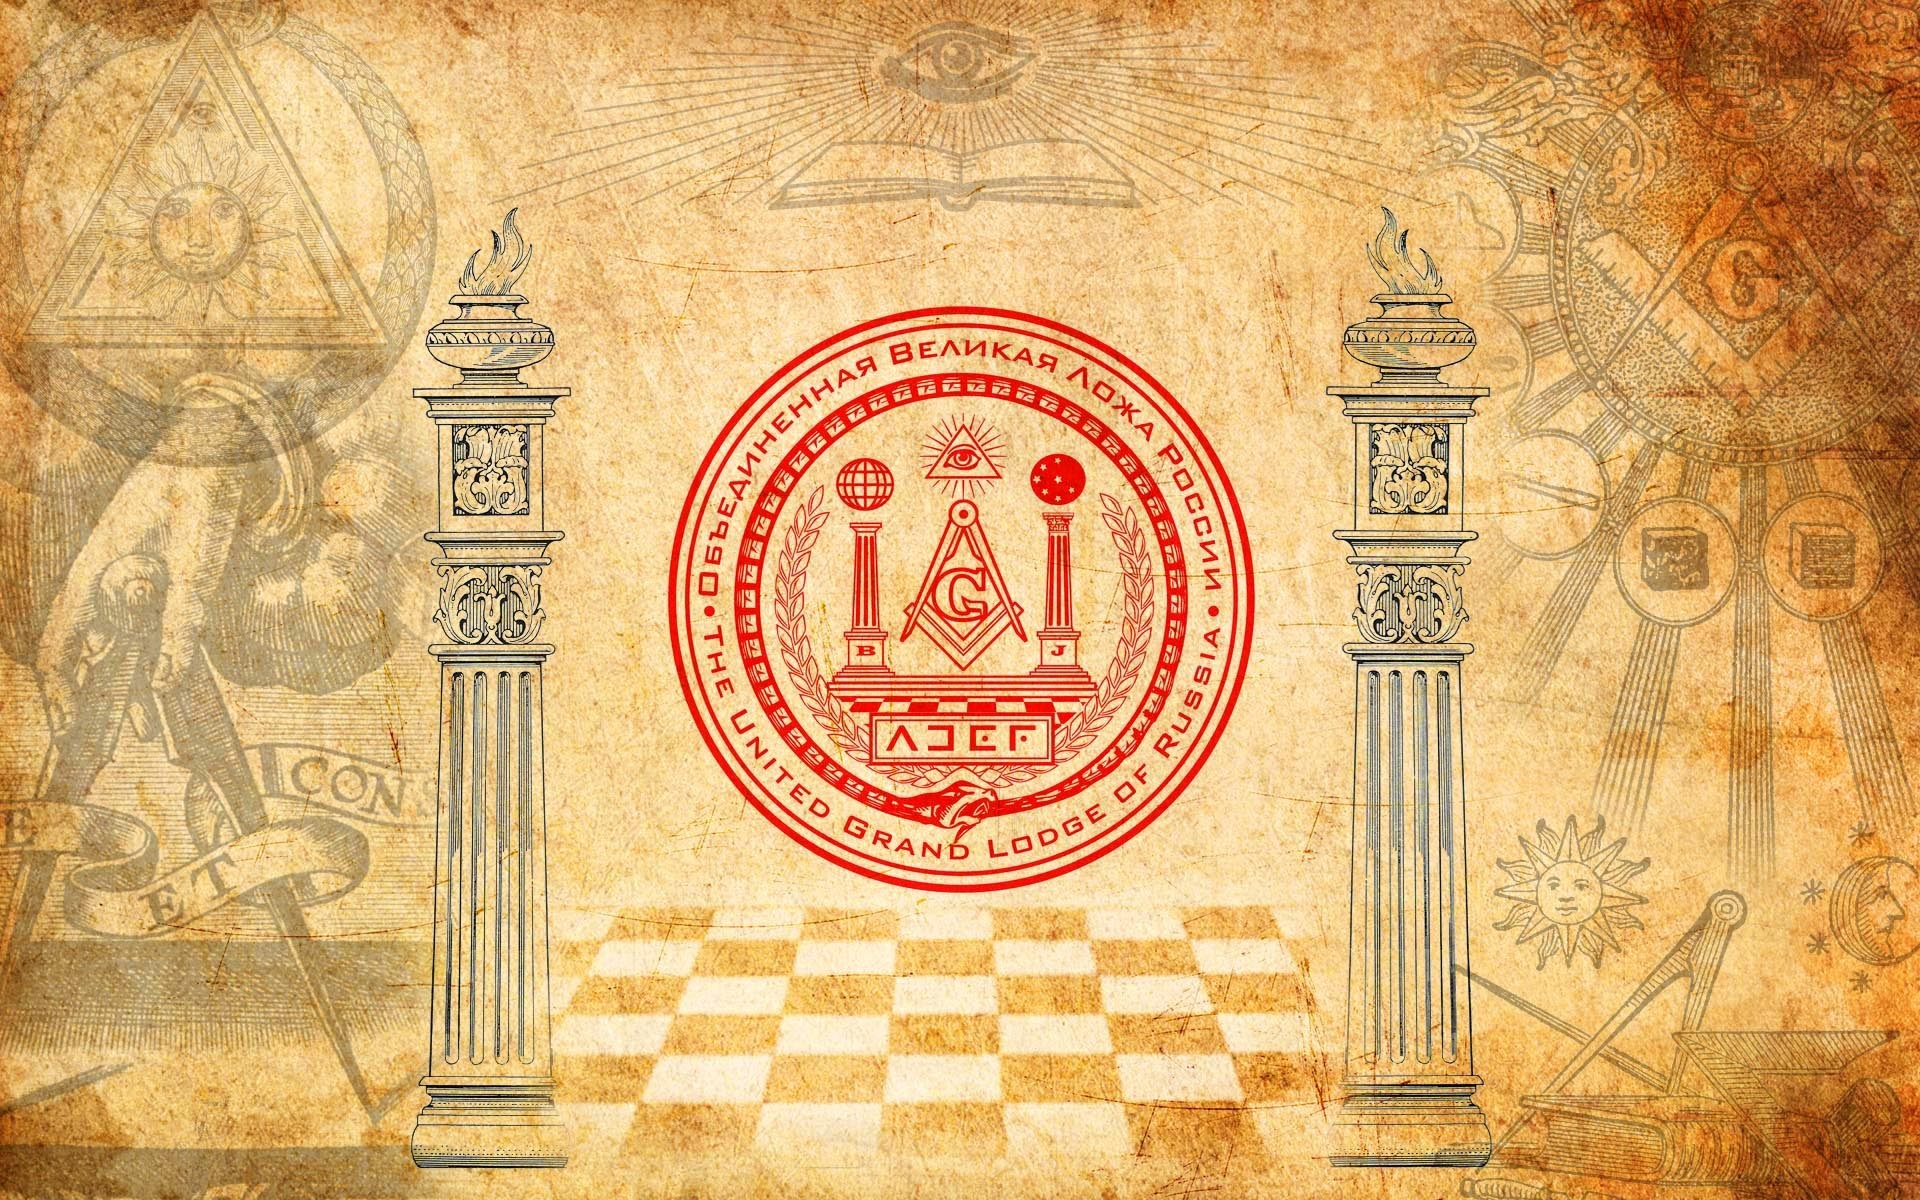 Masonic Knights Templar Wallpaper Wallpapersafari